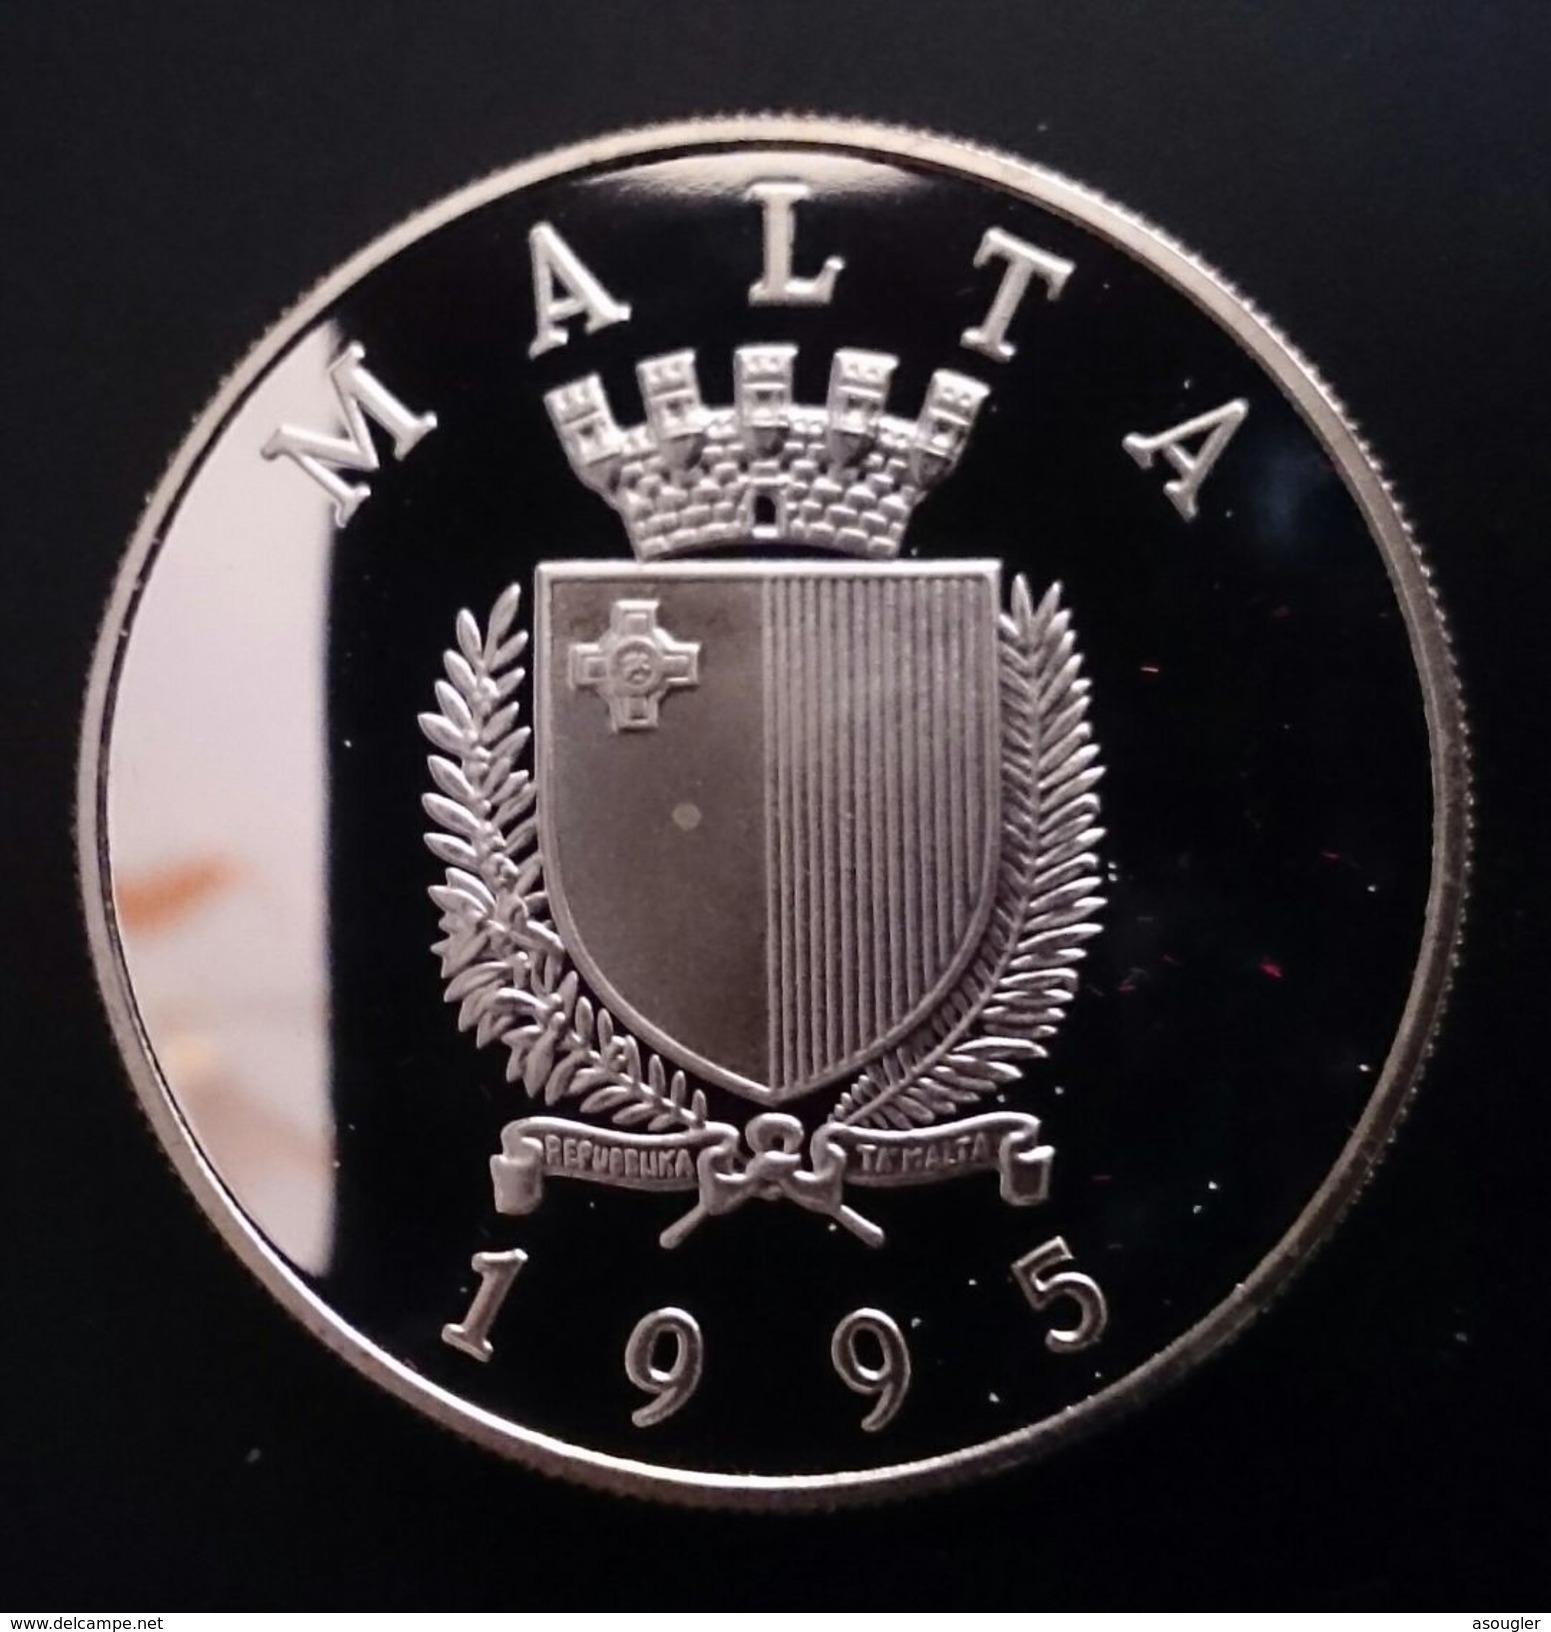 "MALTA 5 LIRI LIRA POUND 1995 SILVER PROOF ""50th Anniversary - United Nations"" Free Shipping Via Registered Air Mail - Malta"